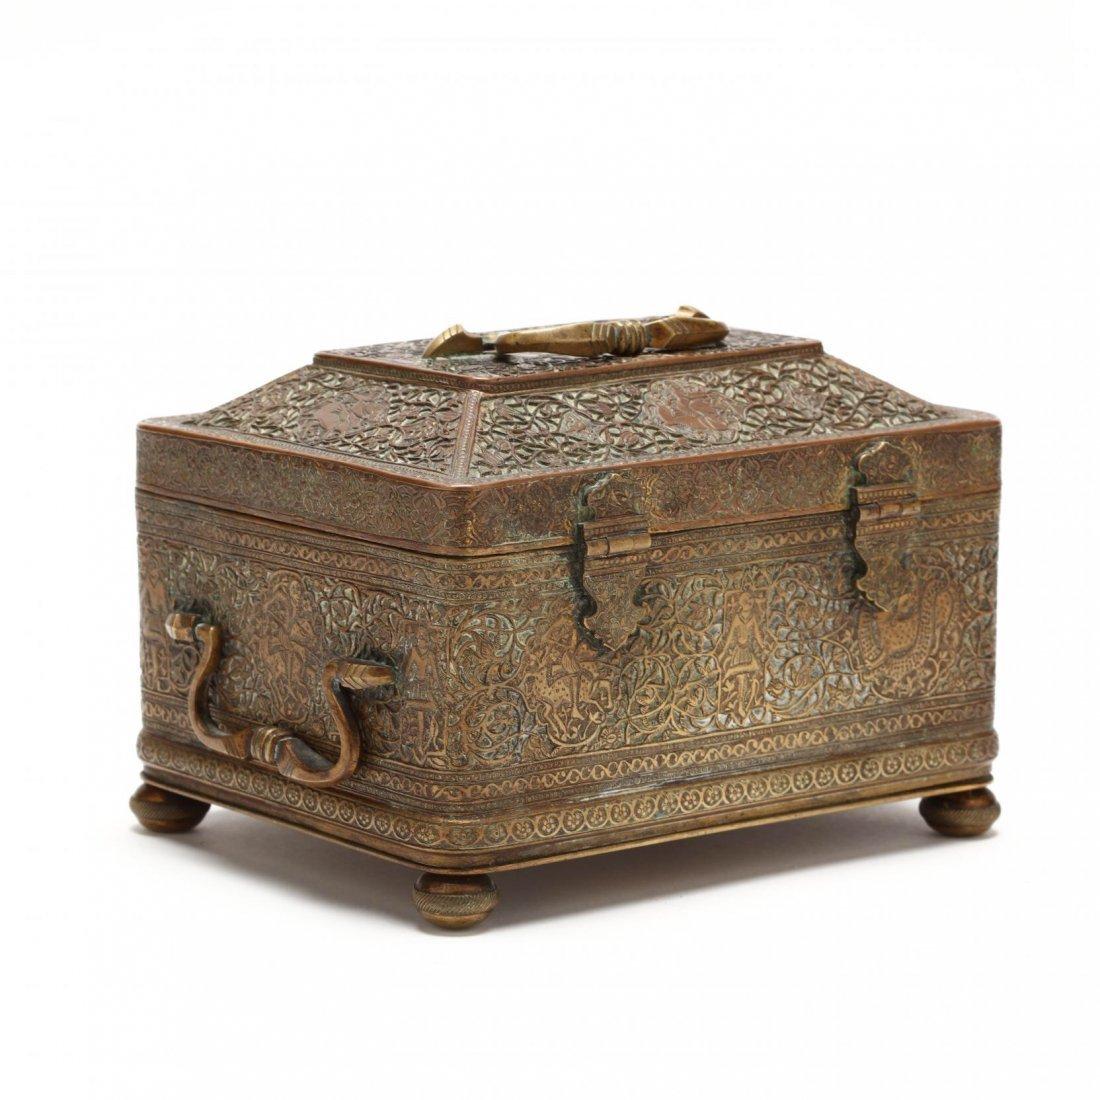 Persian Qajar Copper Jewelry Box c.19th cent AD. - 2